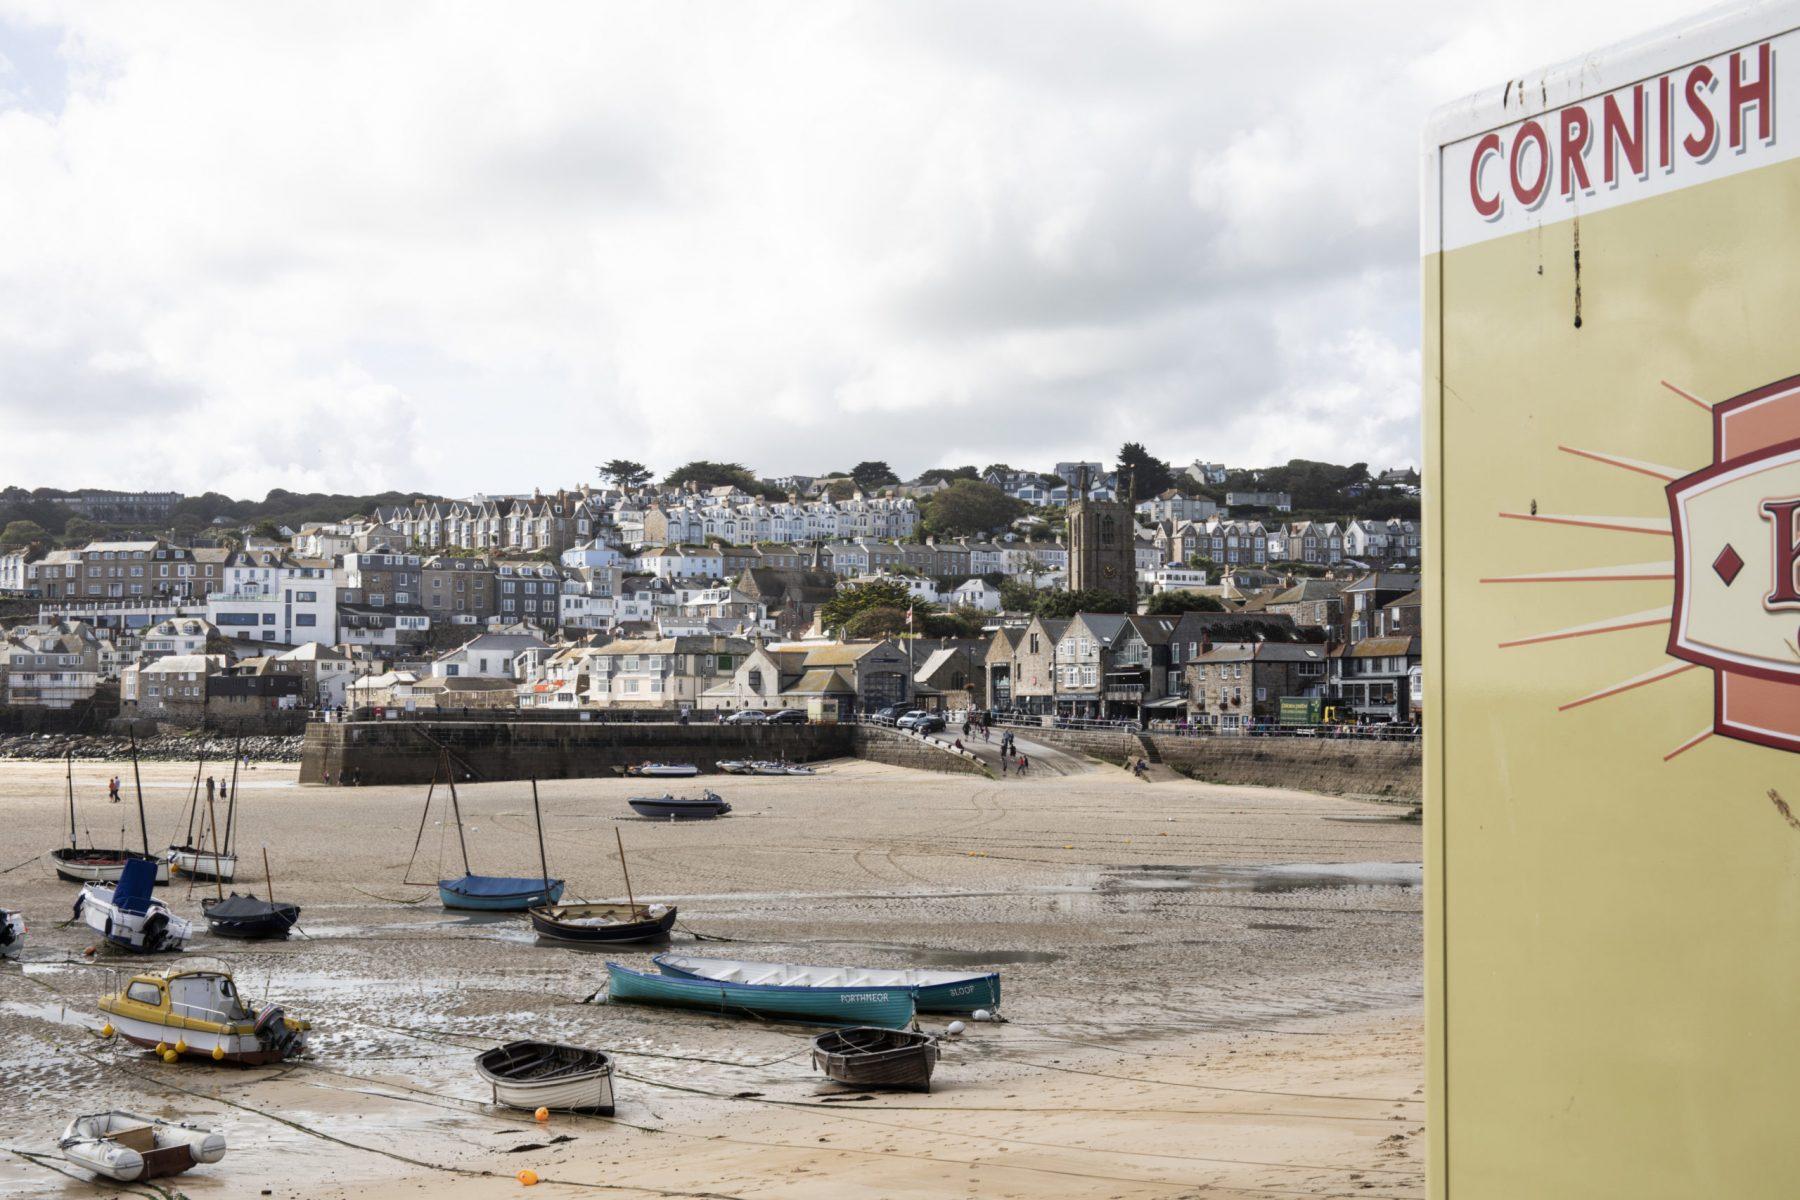 St Ives, Cornwall